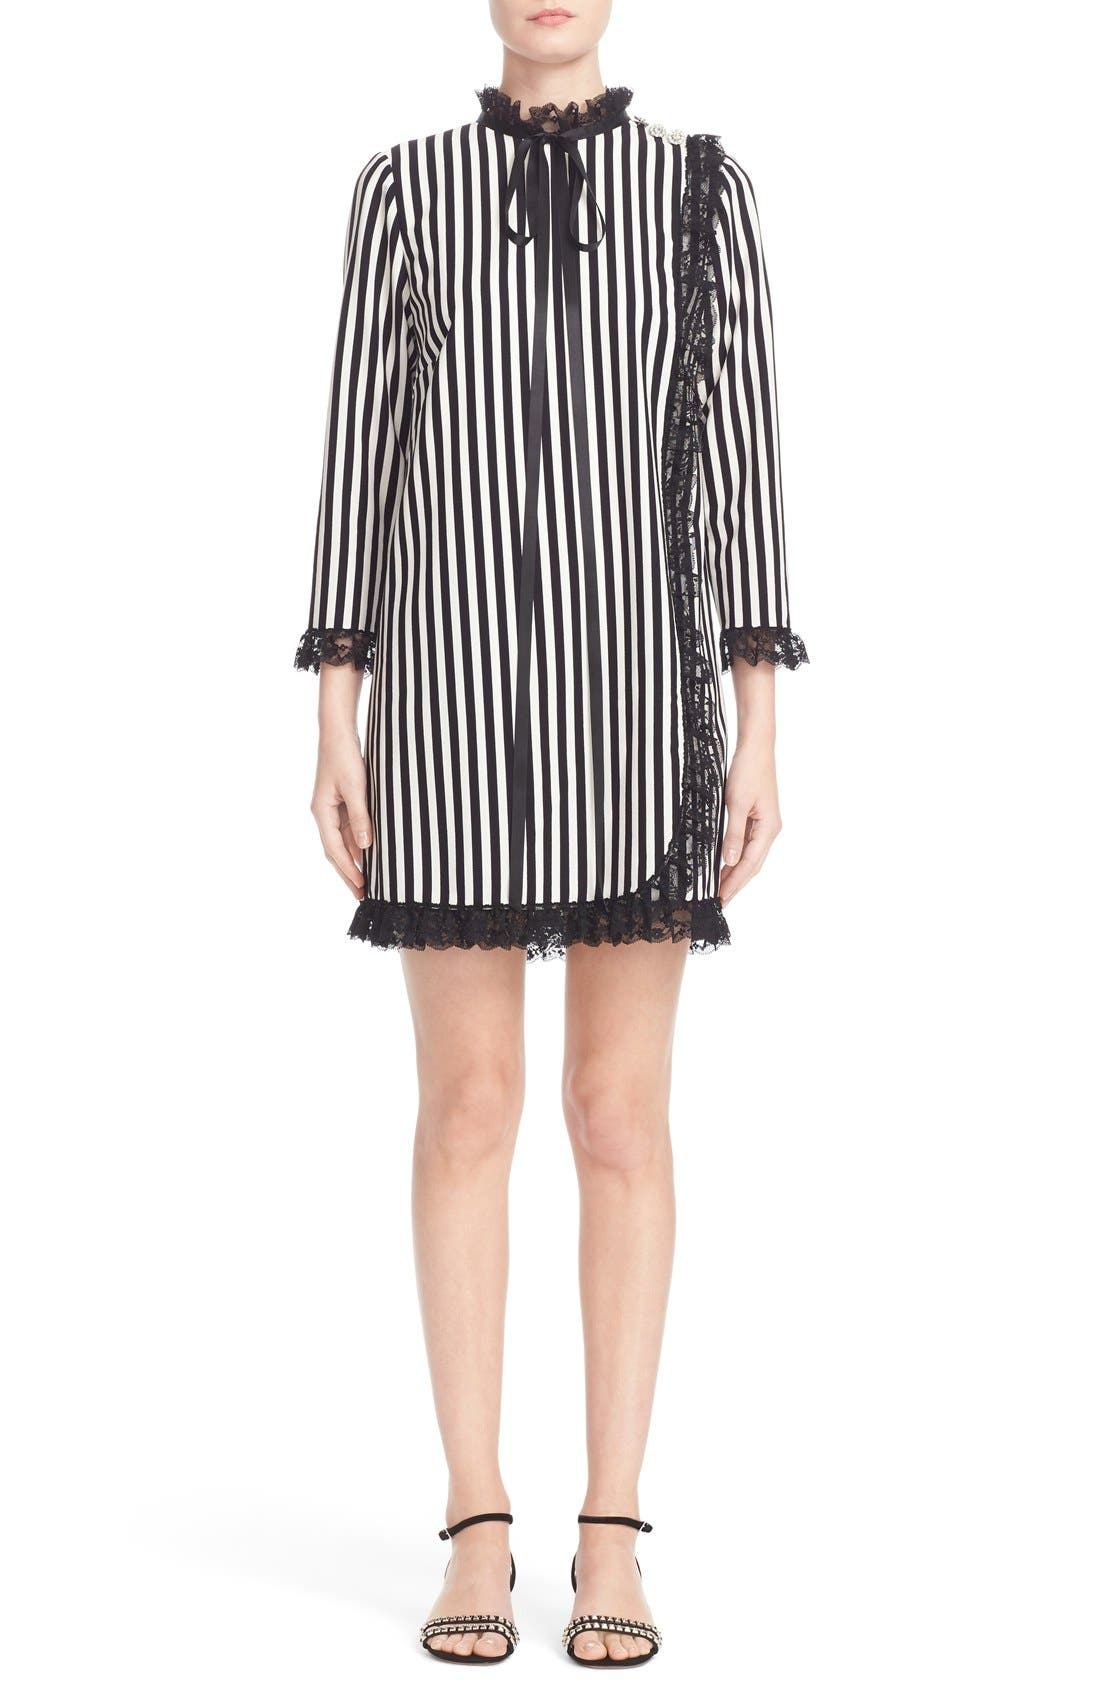 Alternate Image 1 Selected - MARC JACOBS Stripe Crepe Babydoll Dress